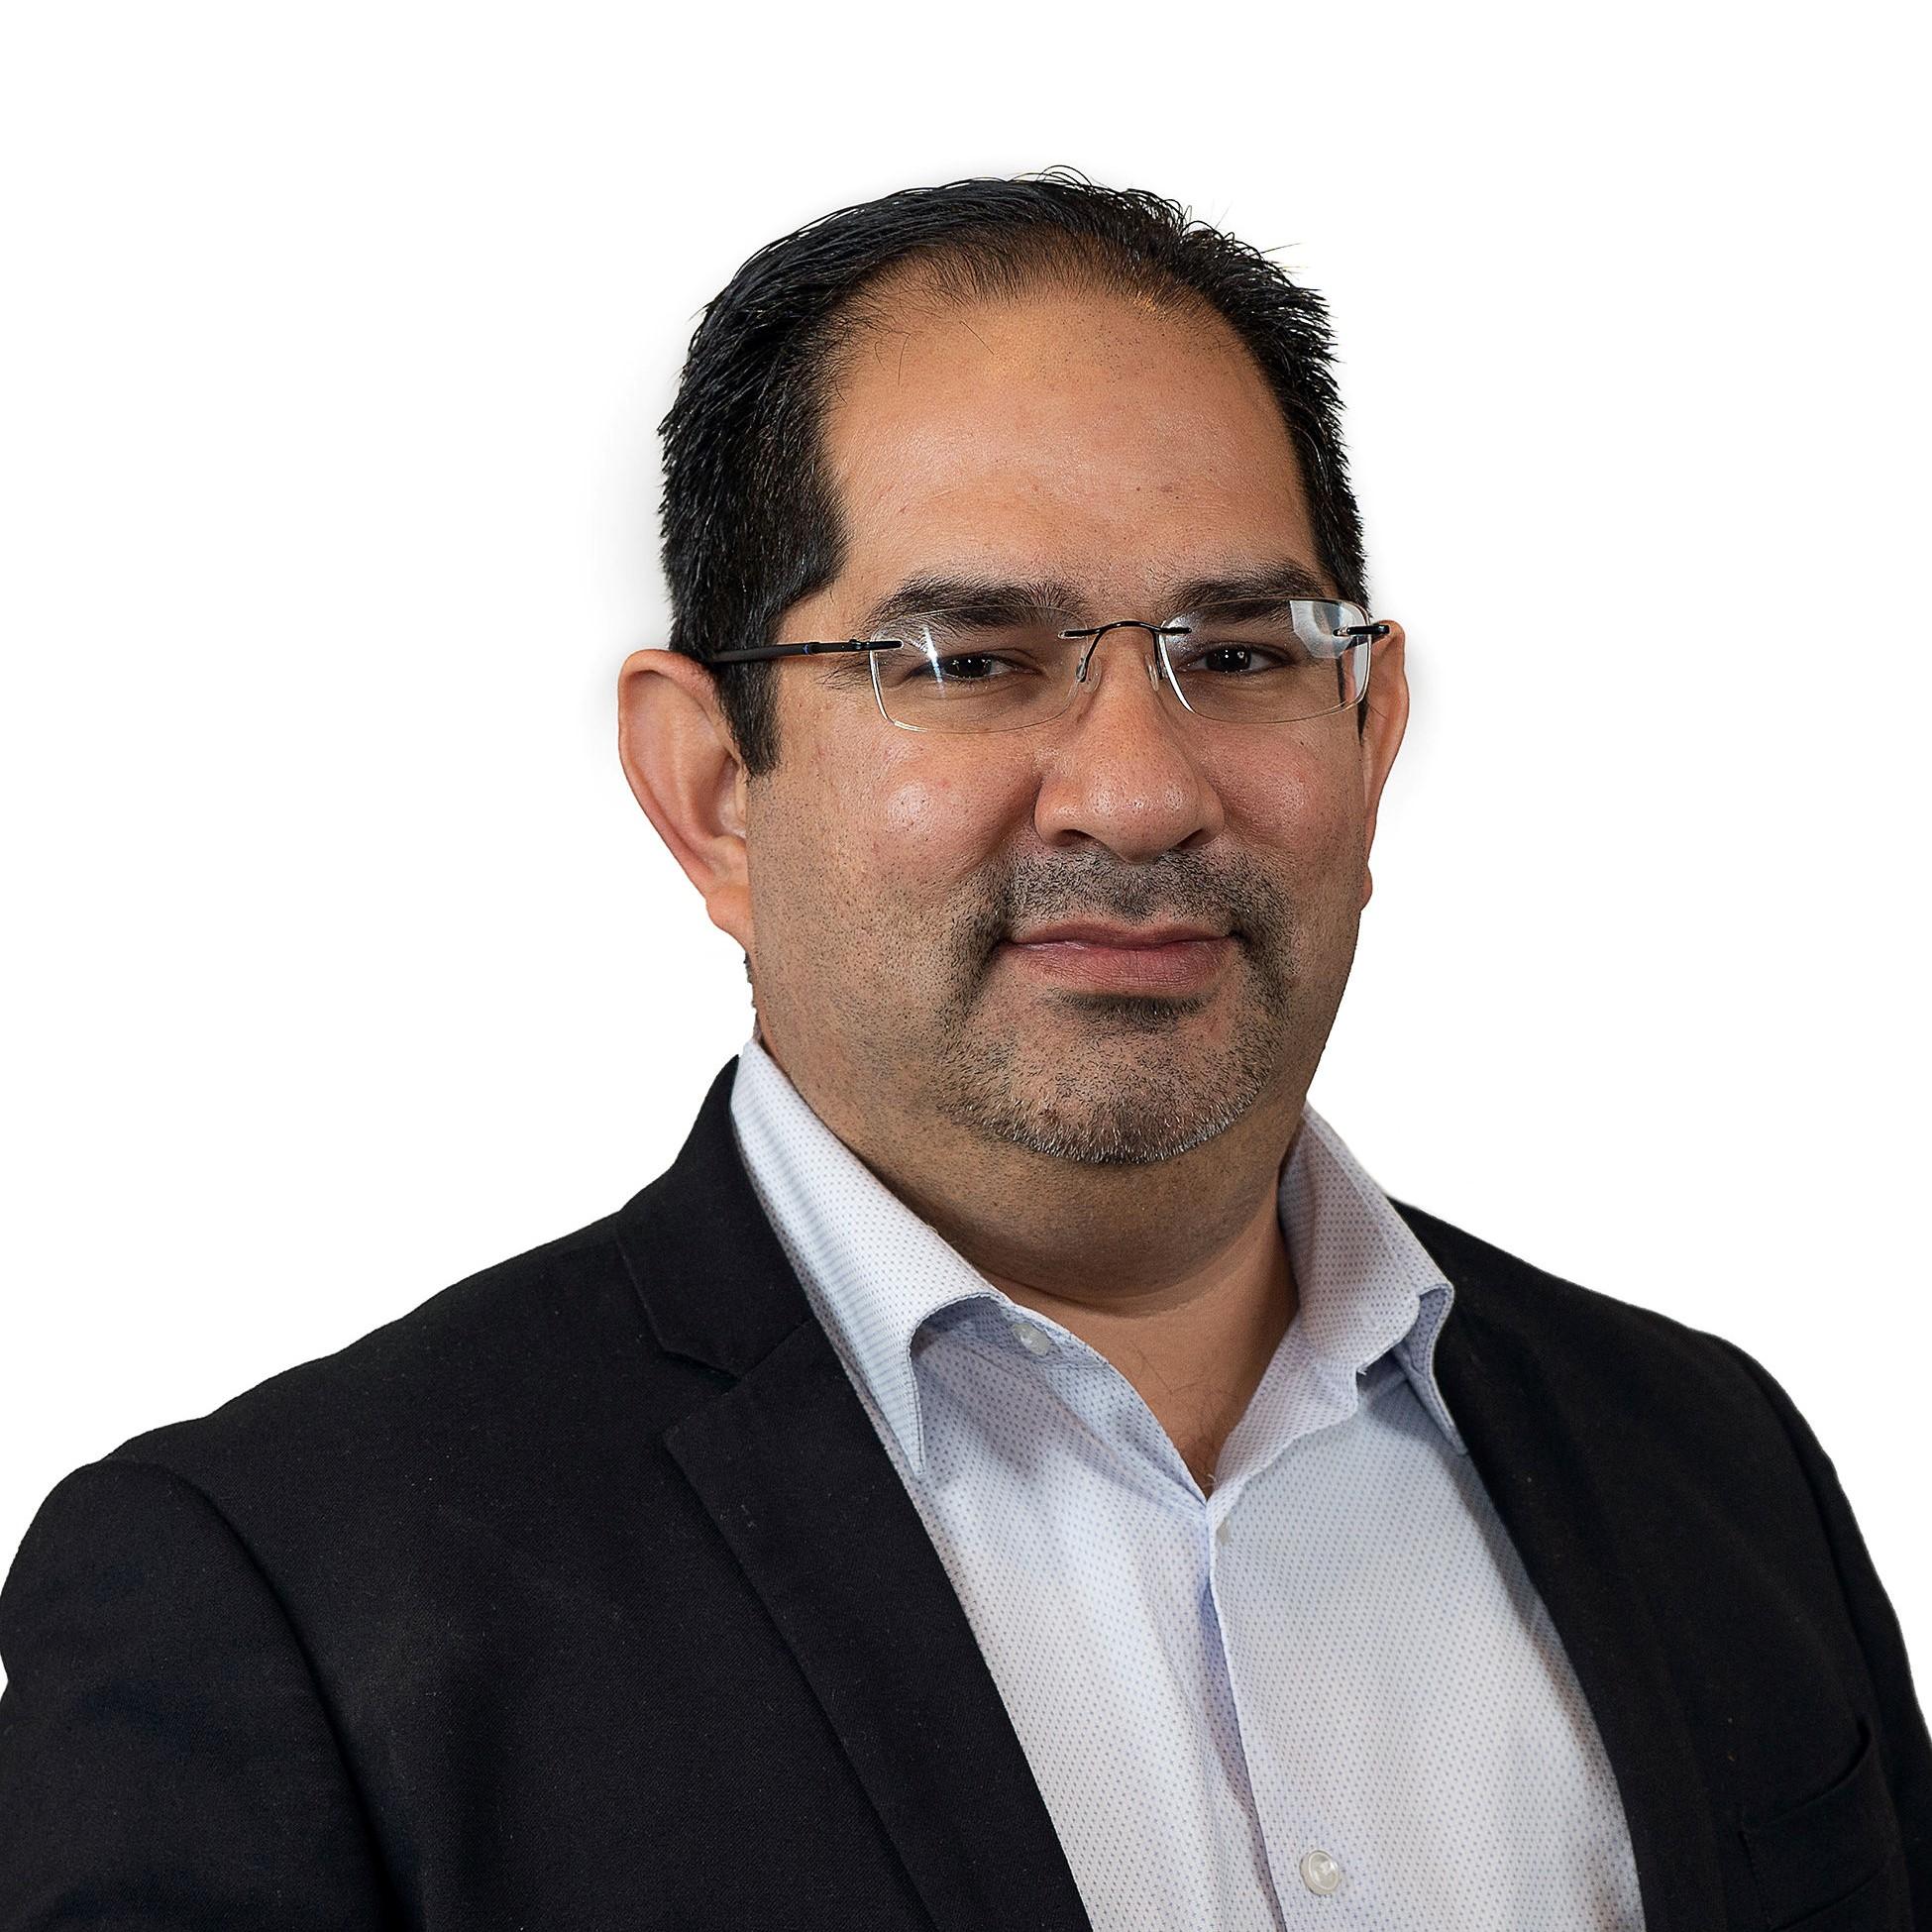 Omar Diaz